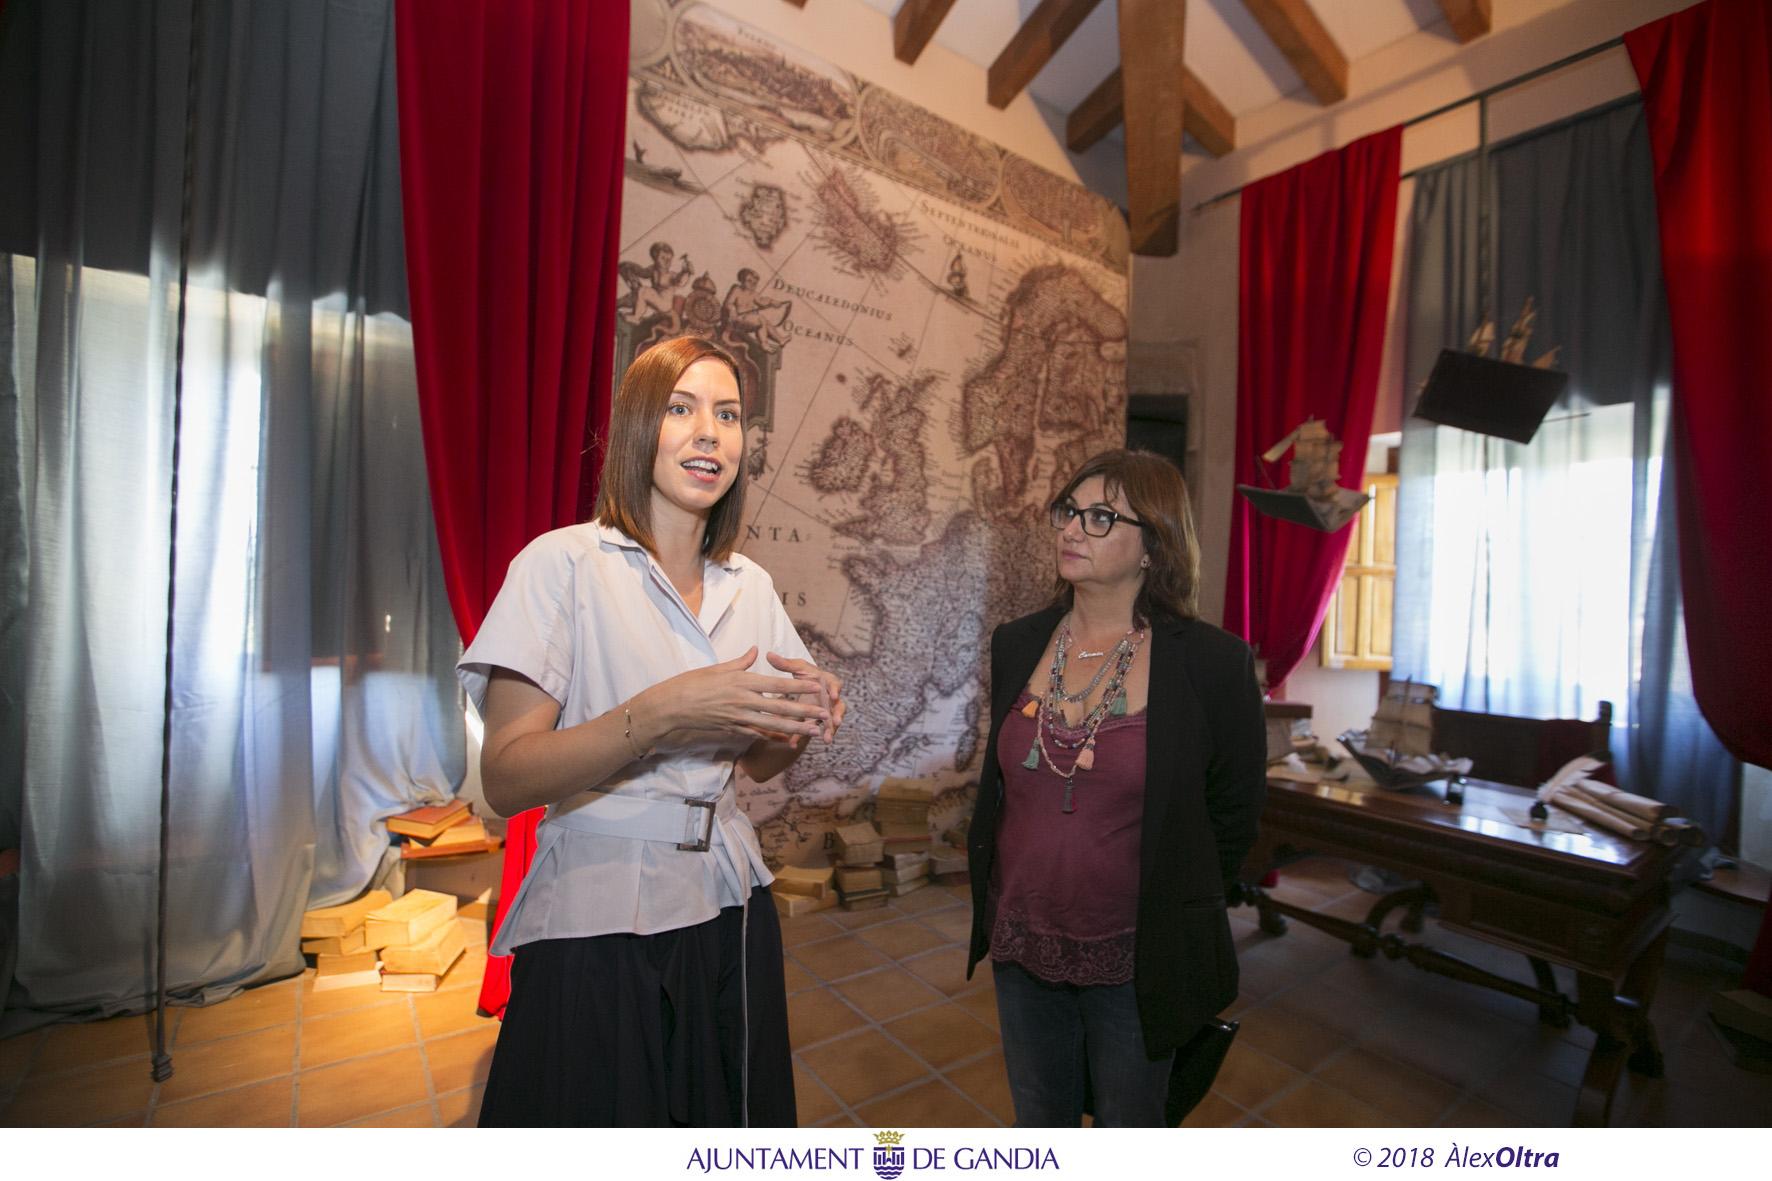 La Generalitat pedirá que la Cova del Parpalló sea patrimonio mundial de la Unesco